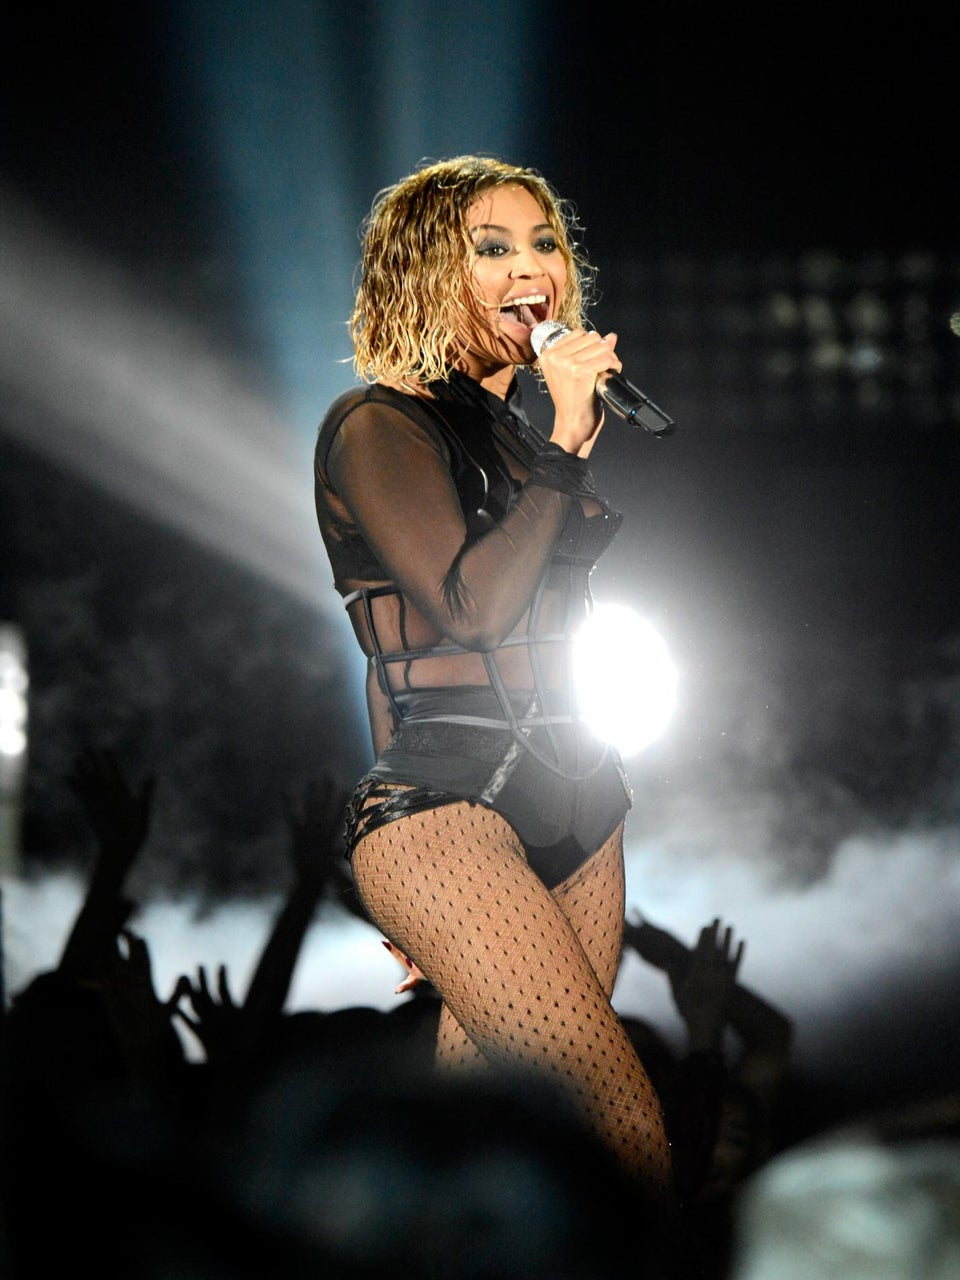 Must-See: Watch Beyoncé's Grammy Performance of 'Drunk In Love'